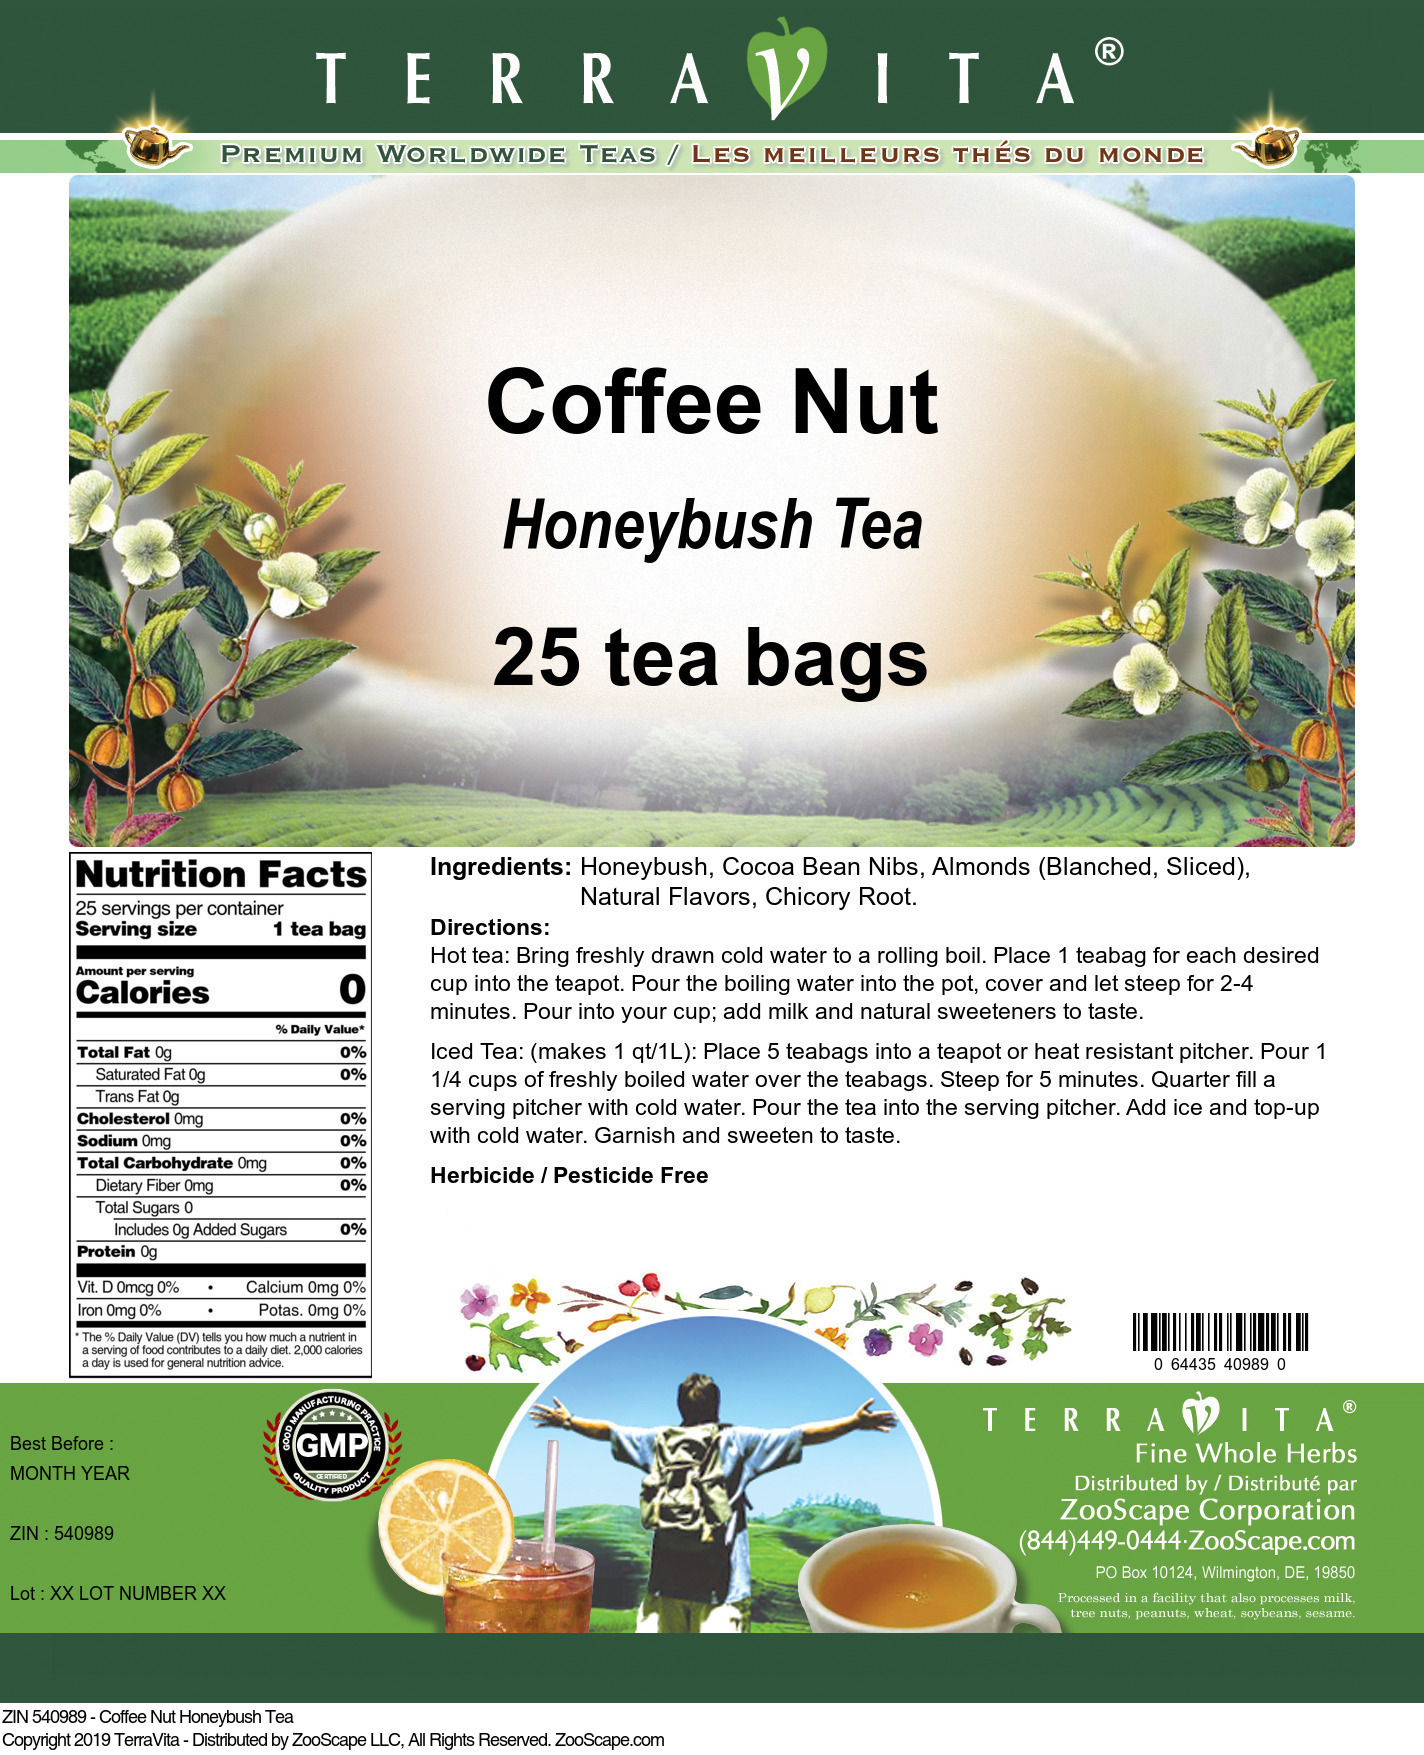 Coffee Nut Honeybush Tea